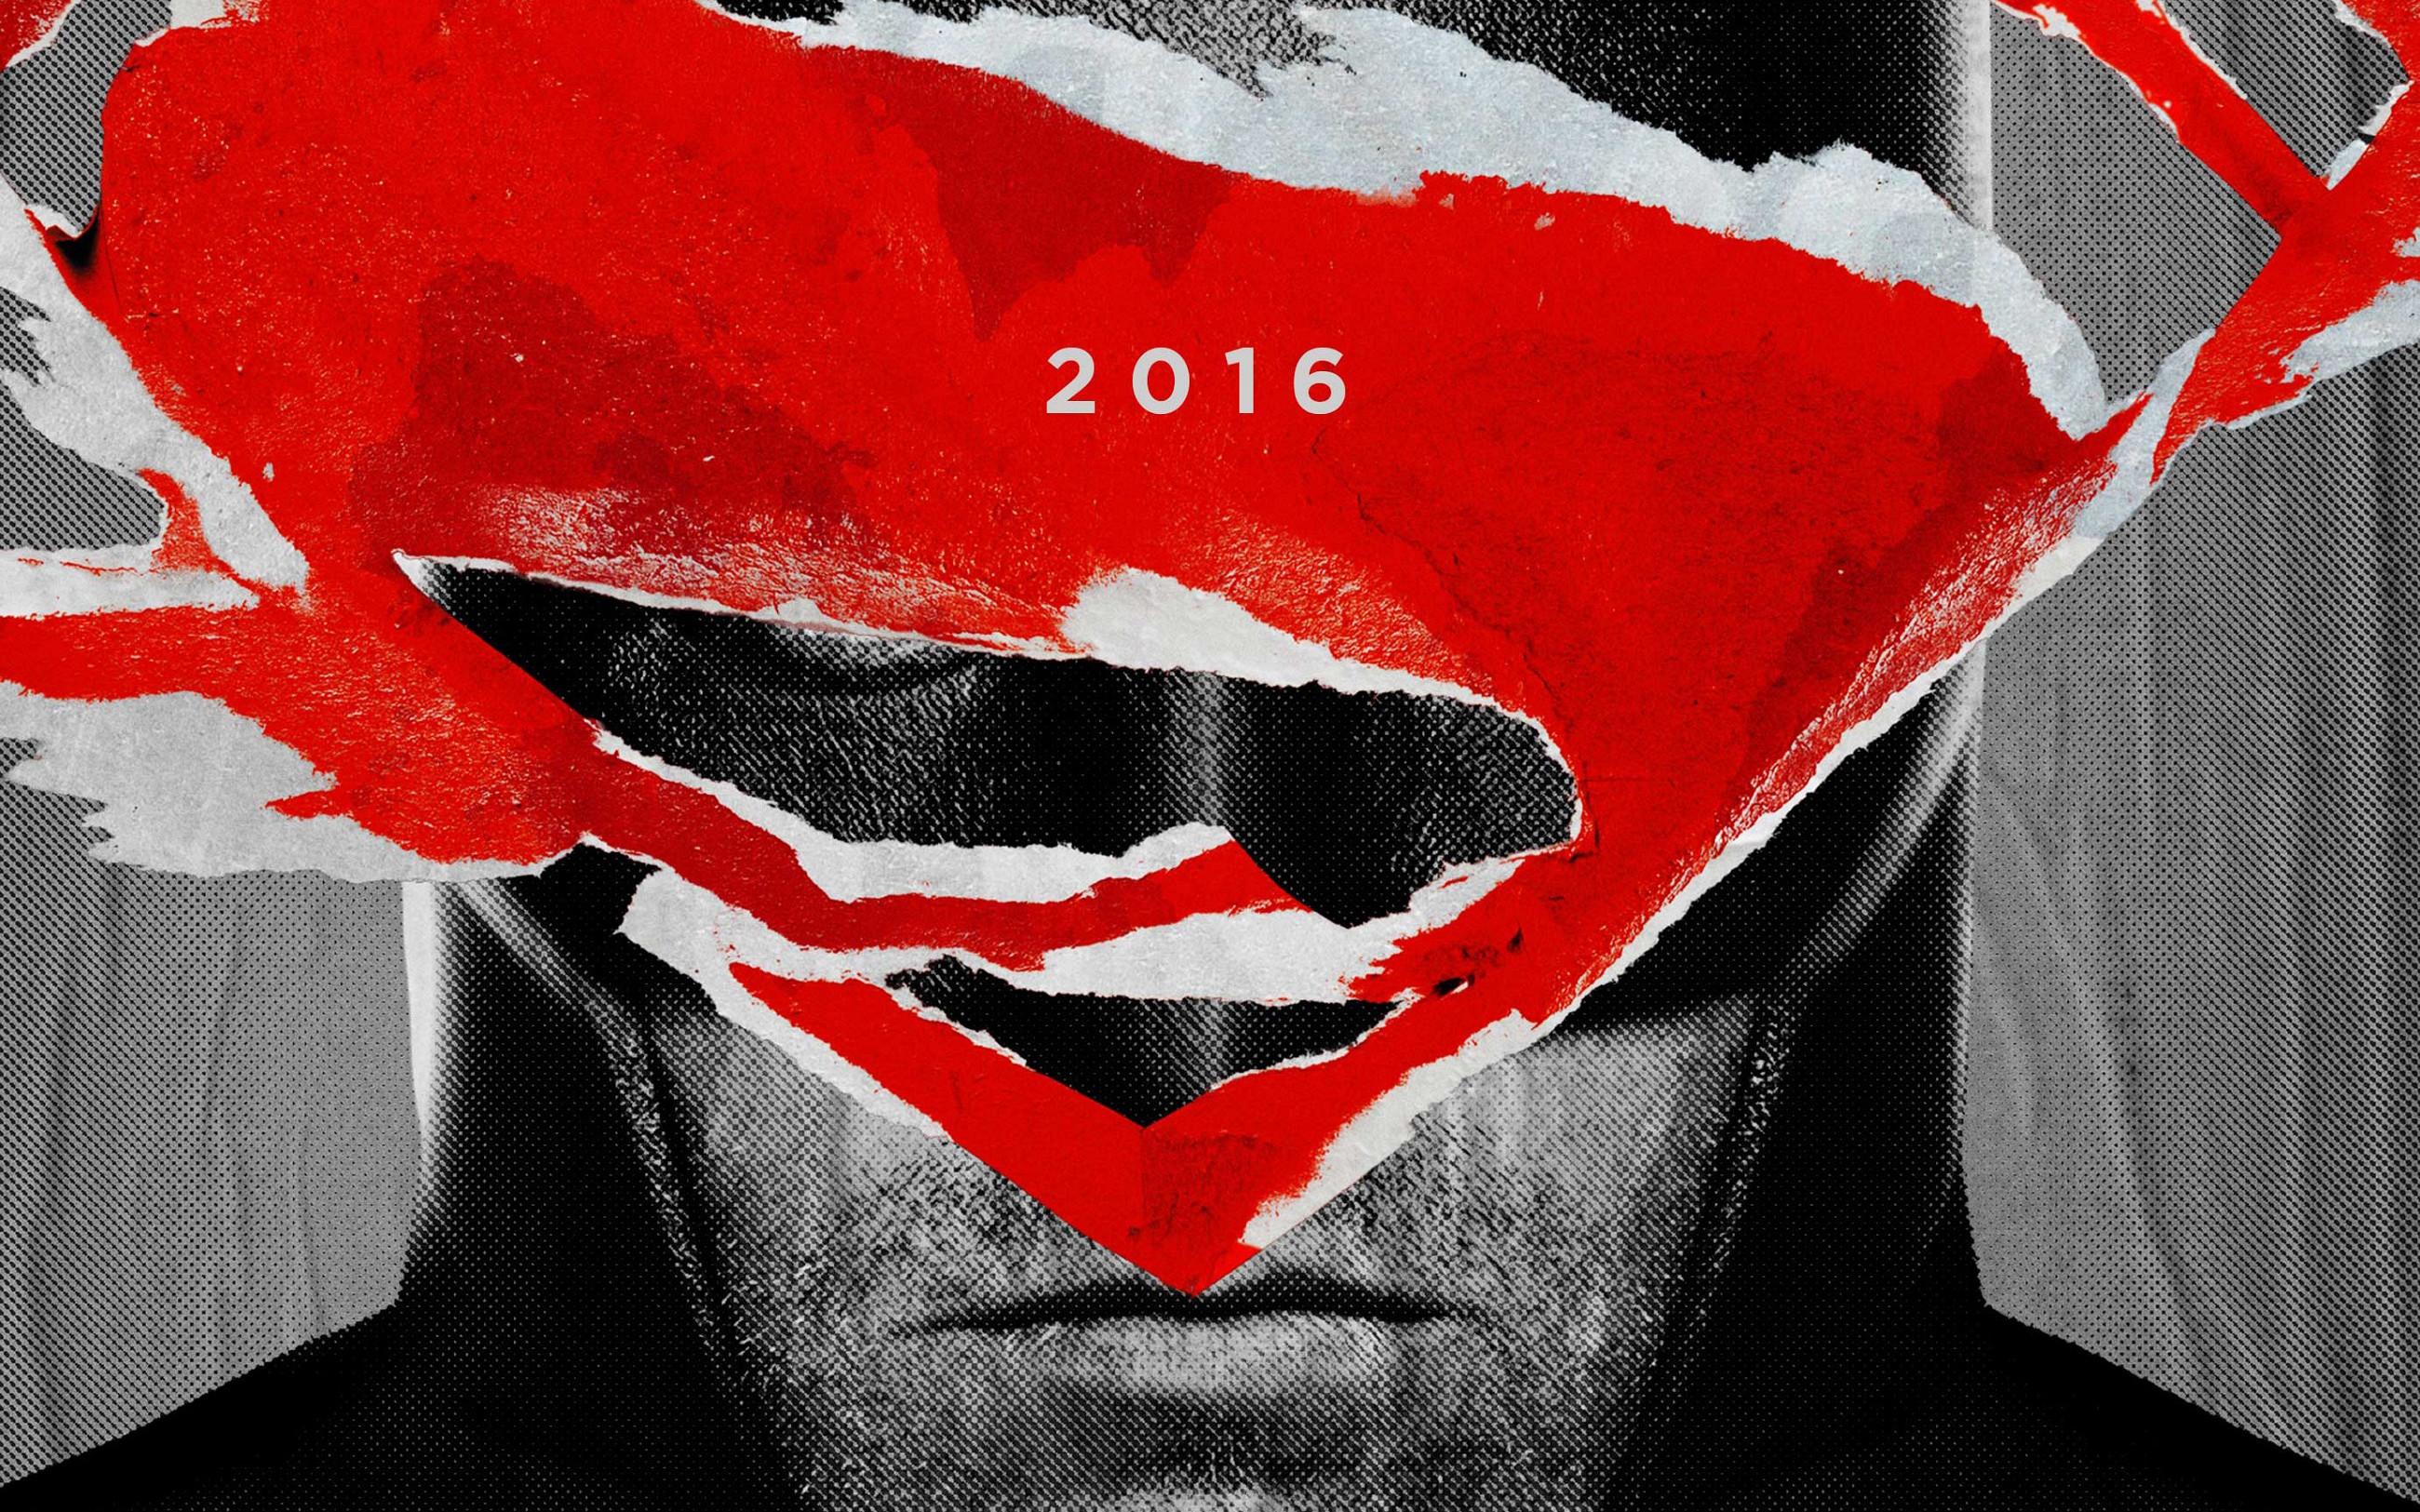 Cool Superman Wallpaper (65+ images)